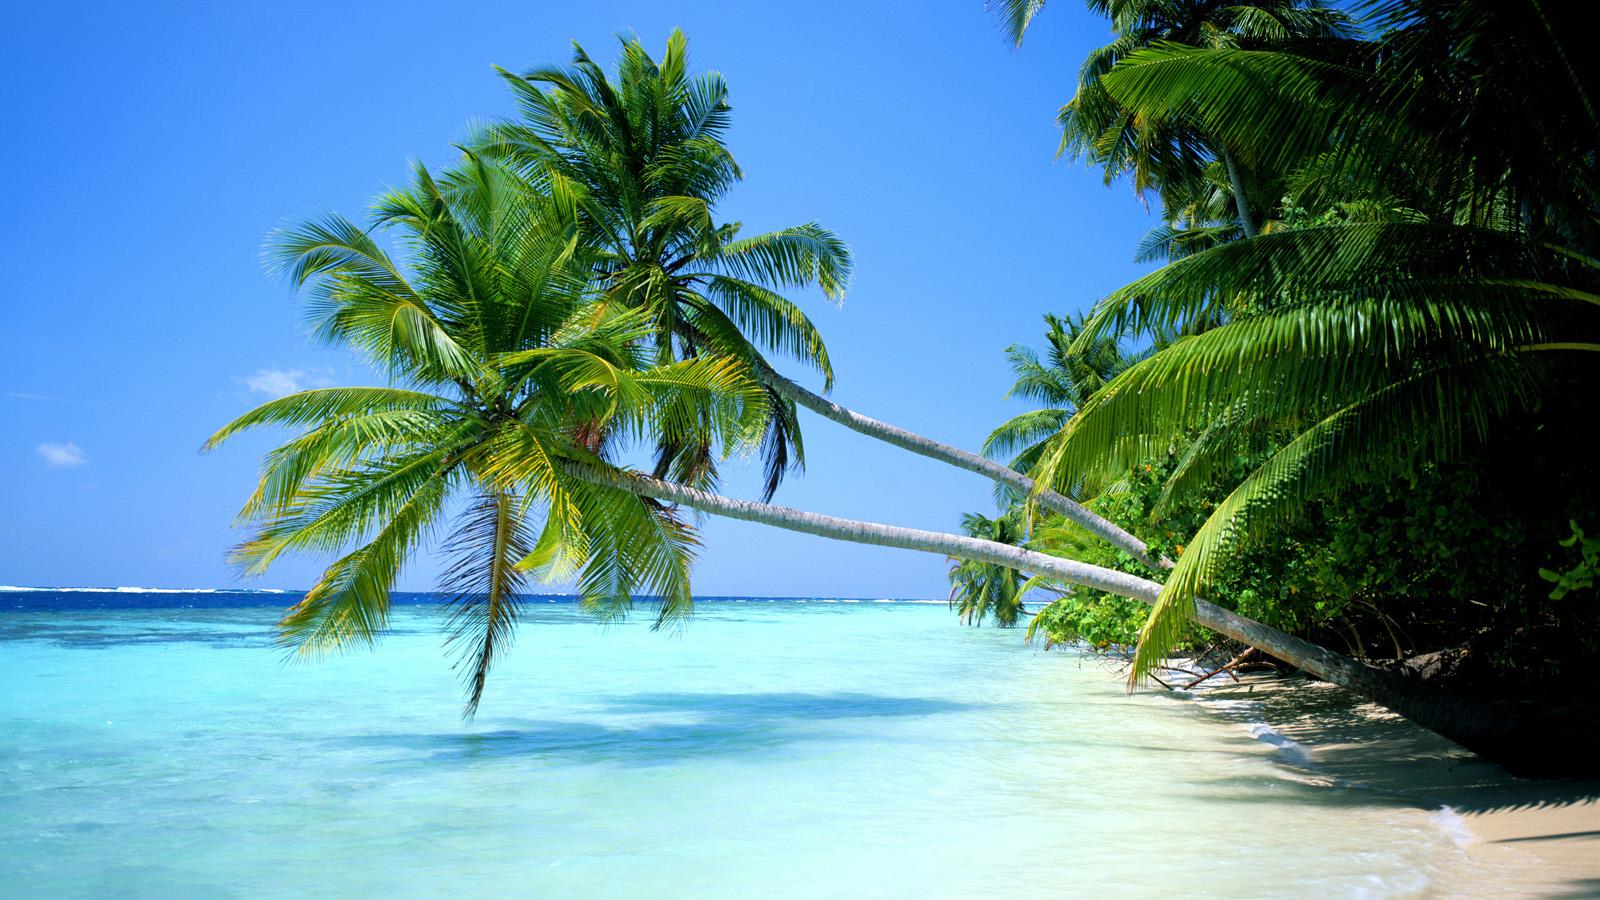 Tropical Beach Desktop Wallpaper 1600x900 pixel Popular HD Wallpaper 1600x900